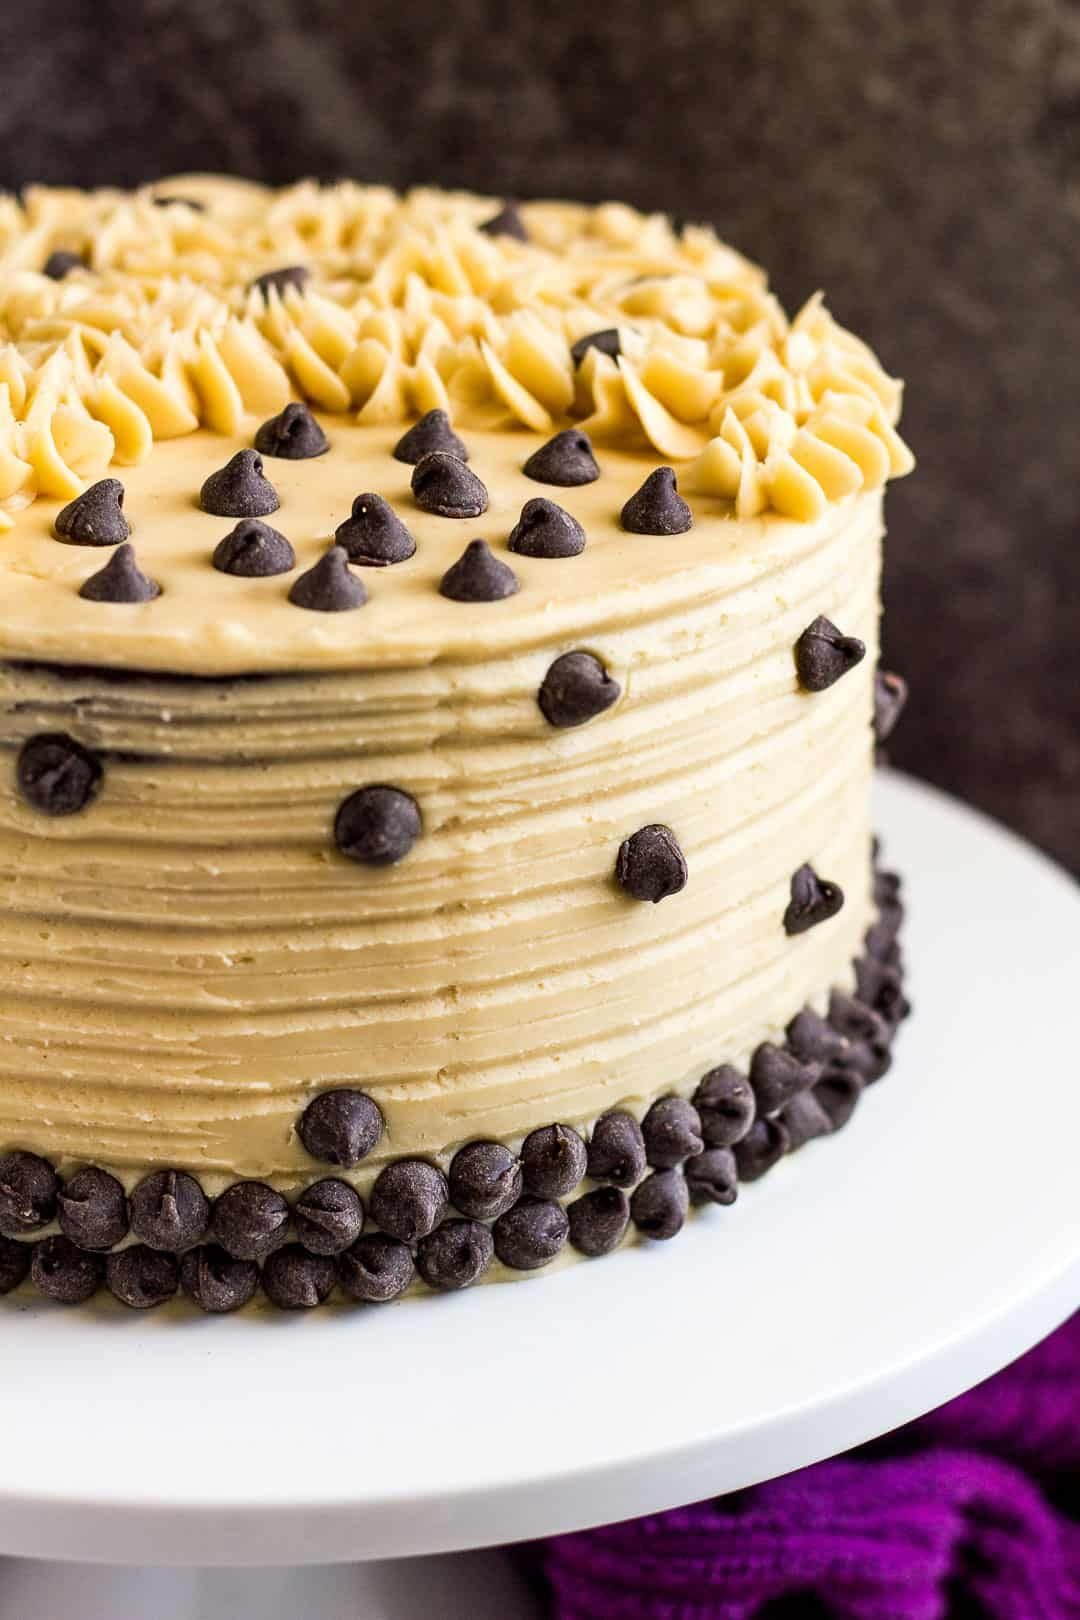 How to make a chocolate mocha cake moist and fluffy